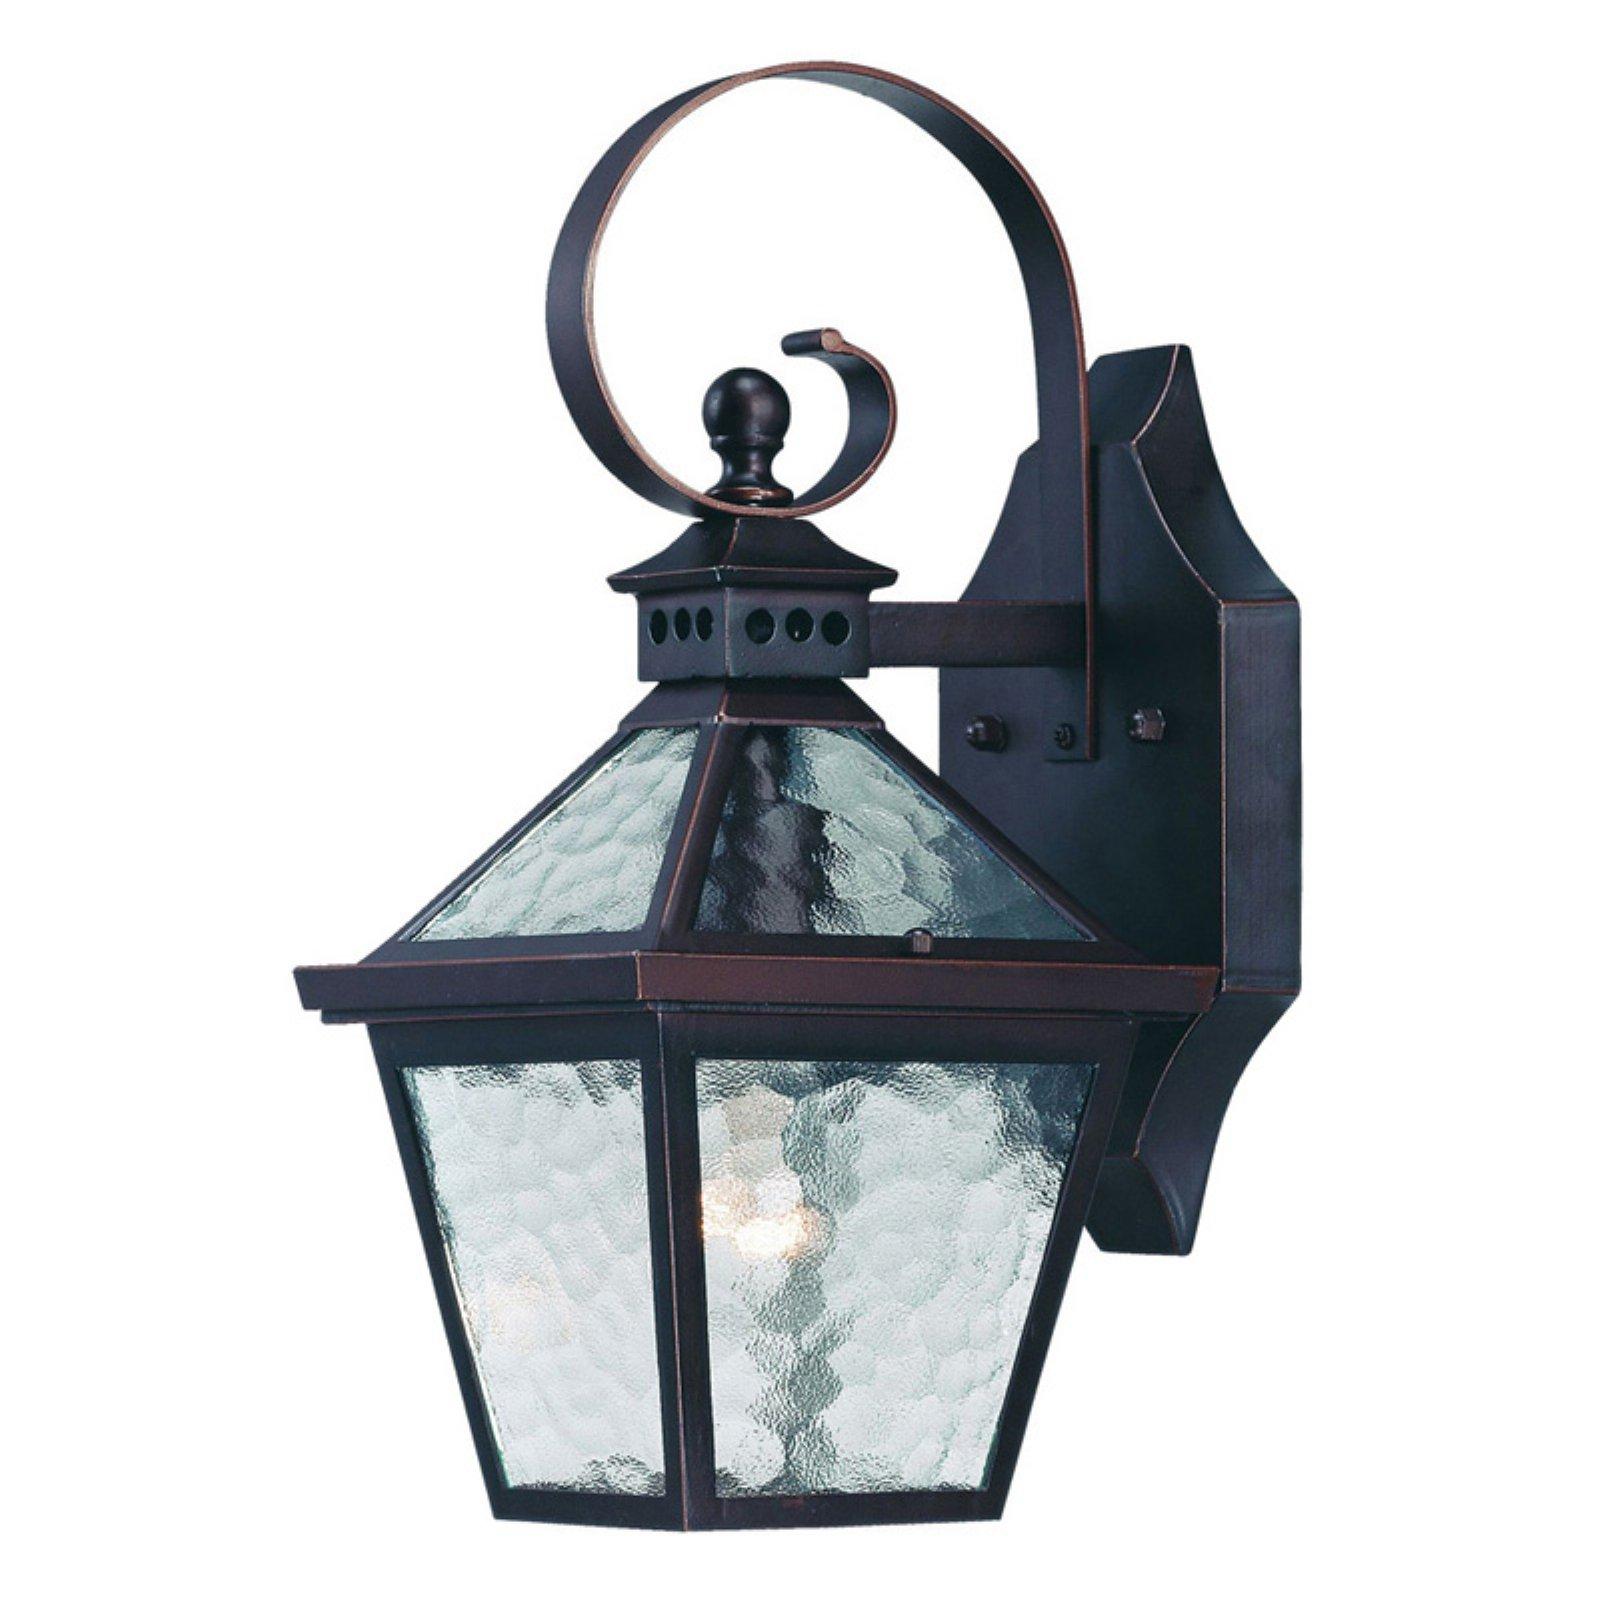 Acclaim Lighting Bay Street 1 Light Outdoor Wall Mount Light Fixture